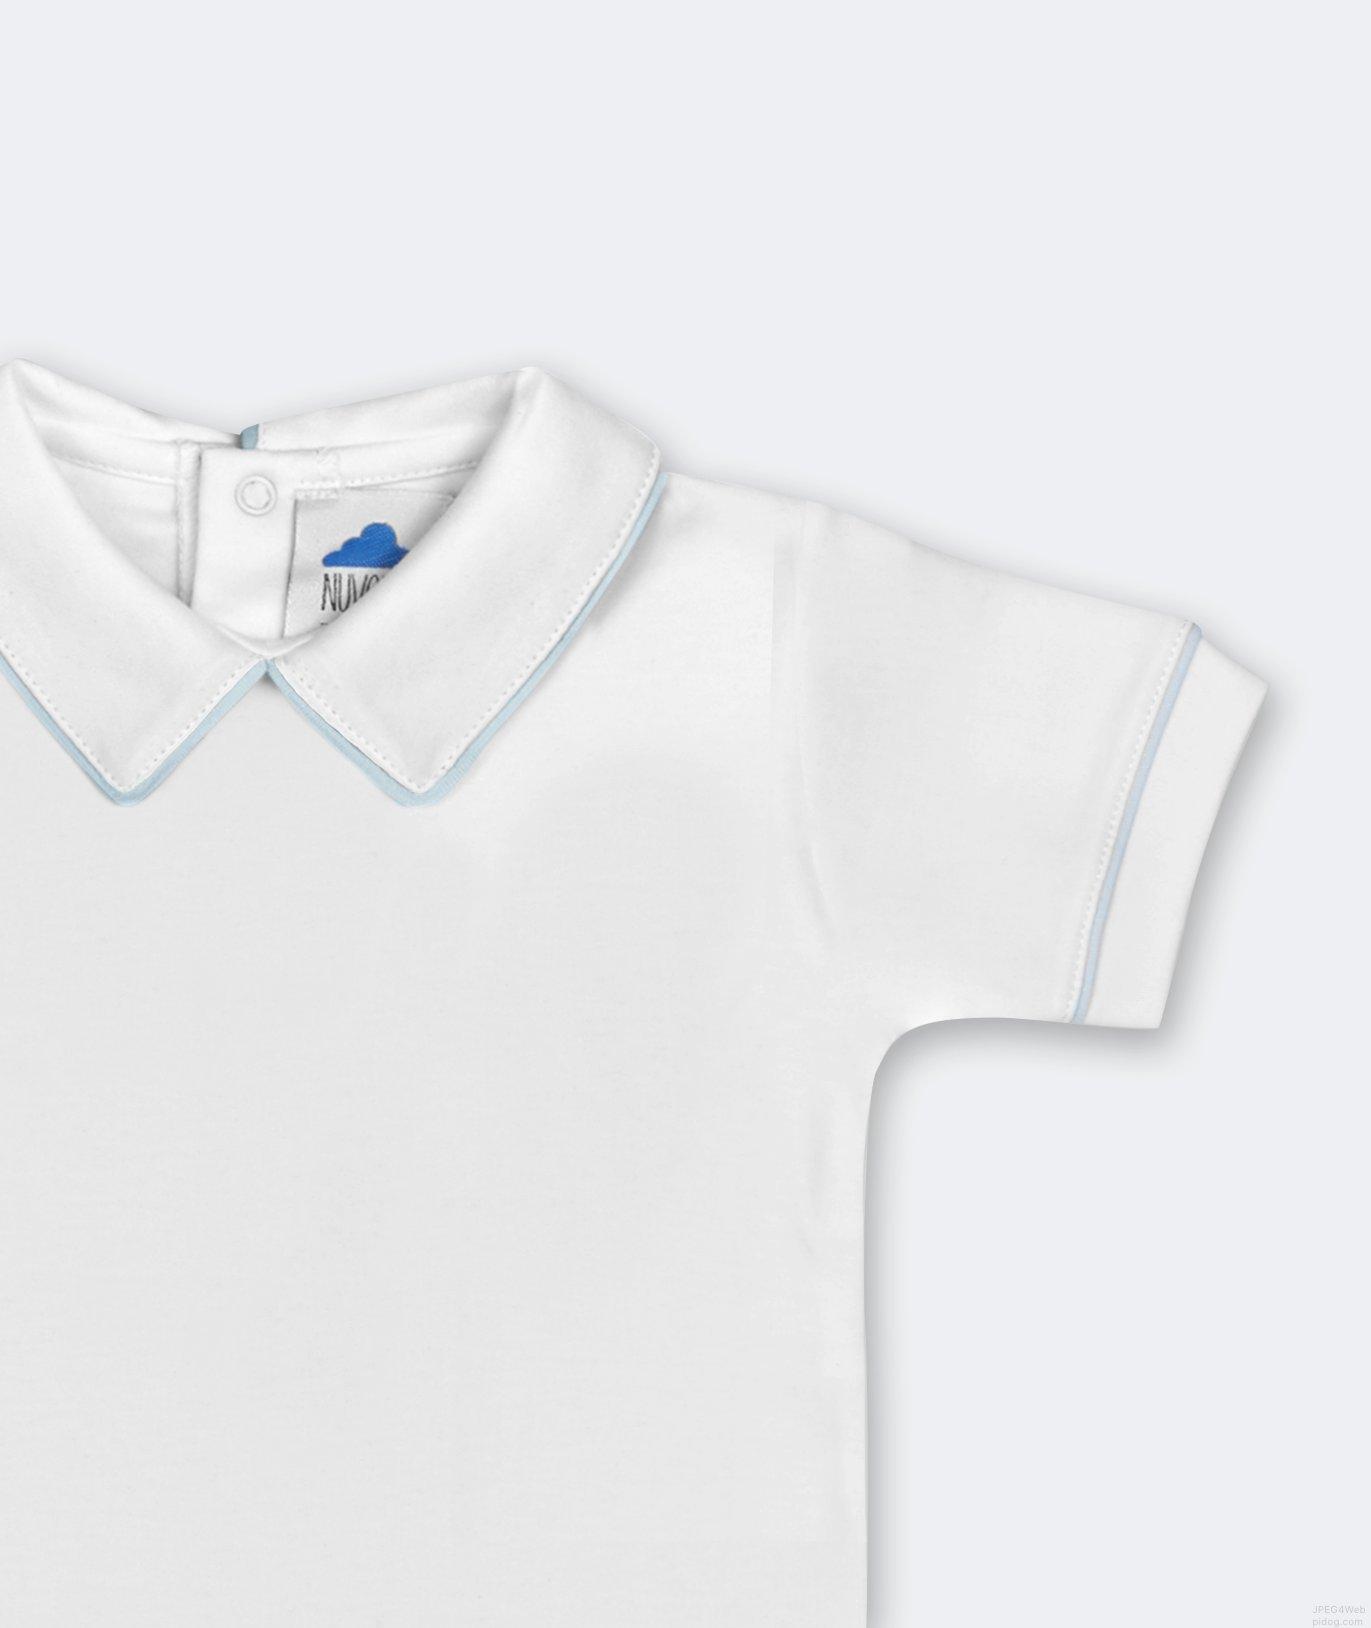 Chic Body Short Sleeves White Blue